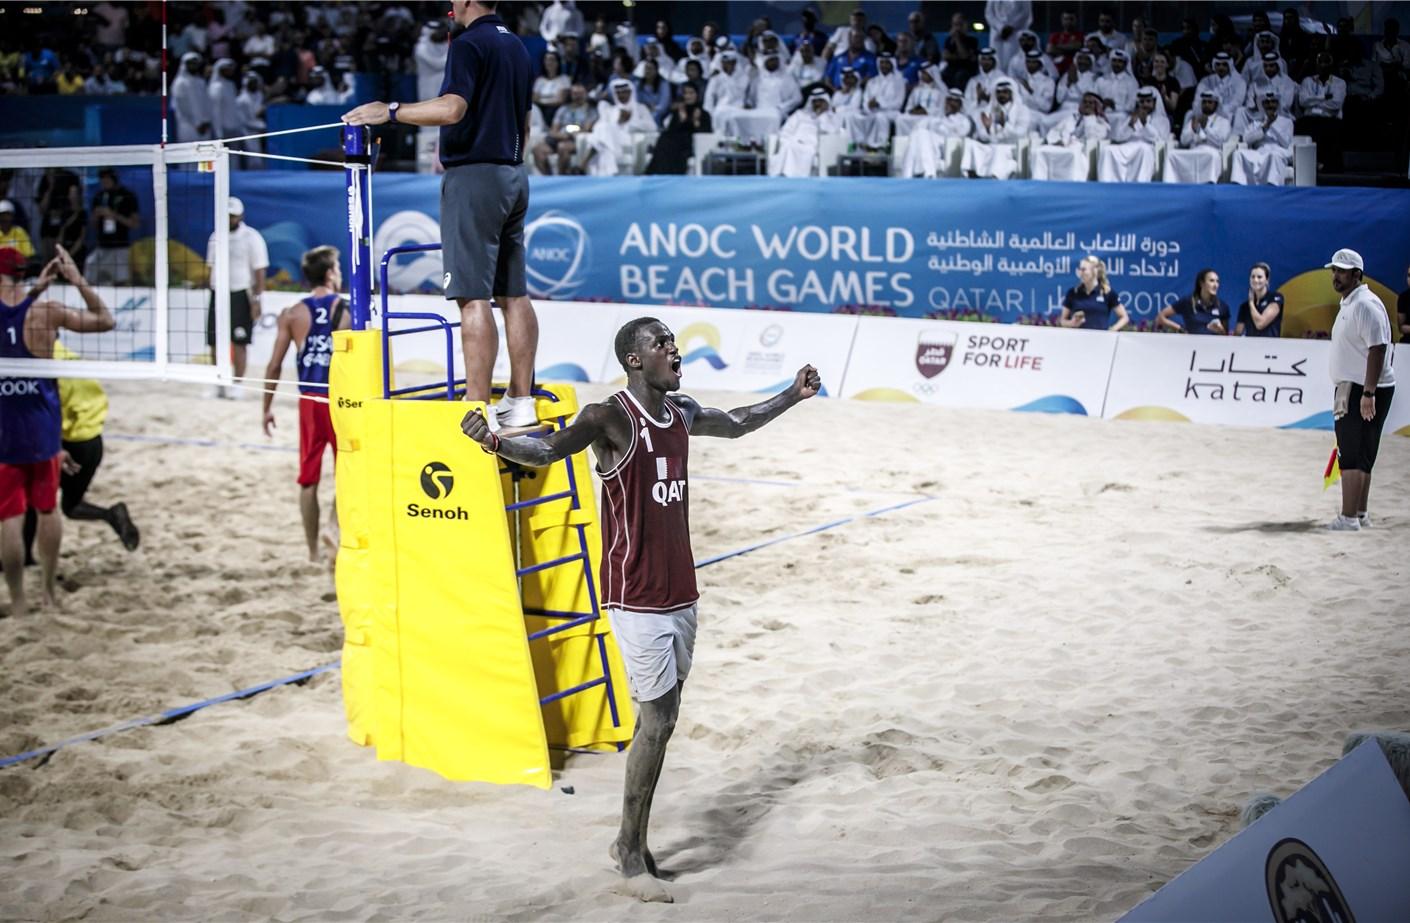 World Beach Games - Beach Volleyball 4x4